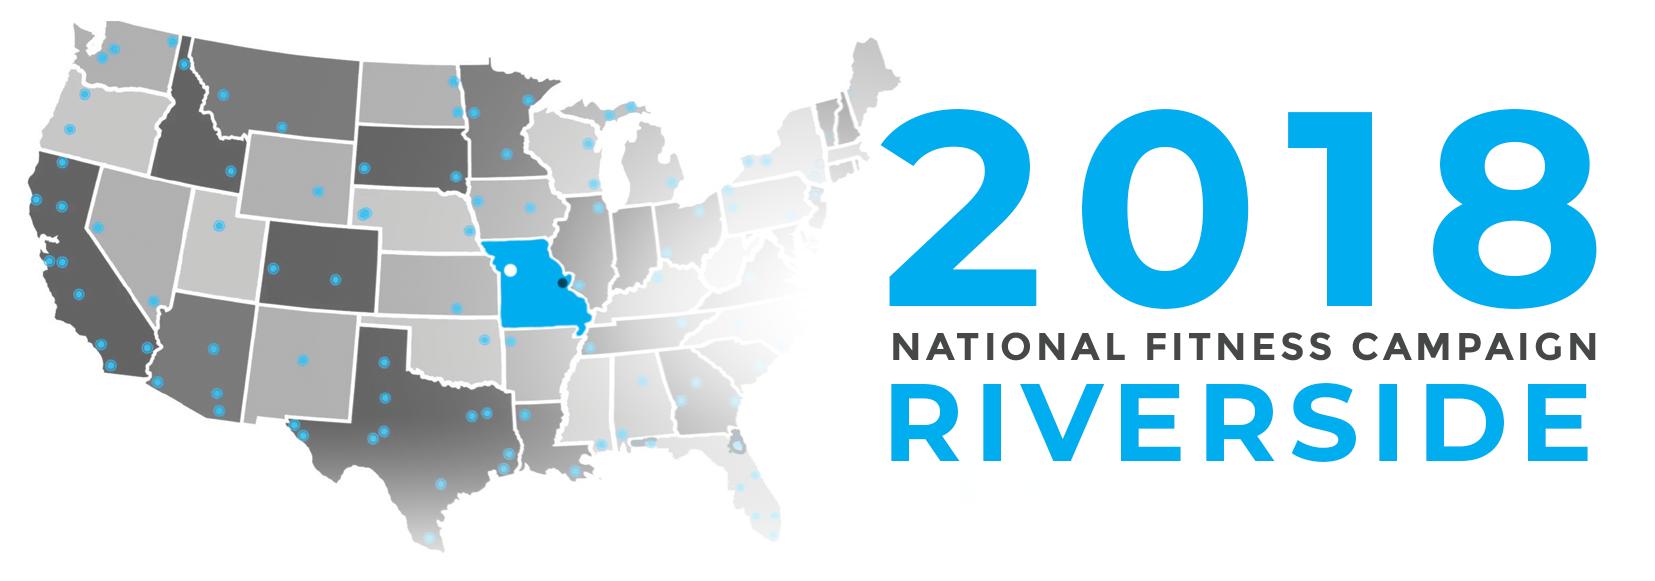 2018 Campaign Logo Riverside.png